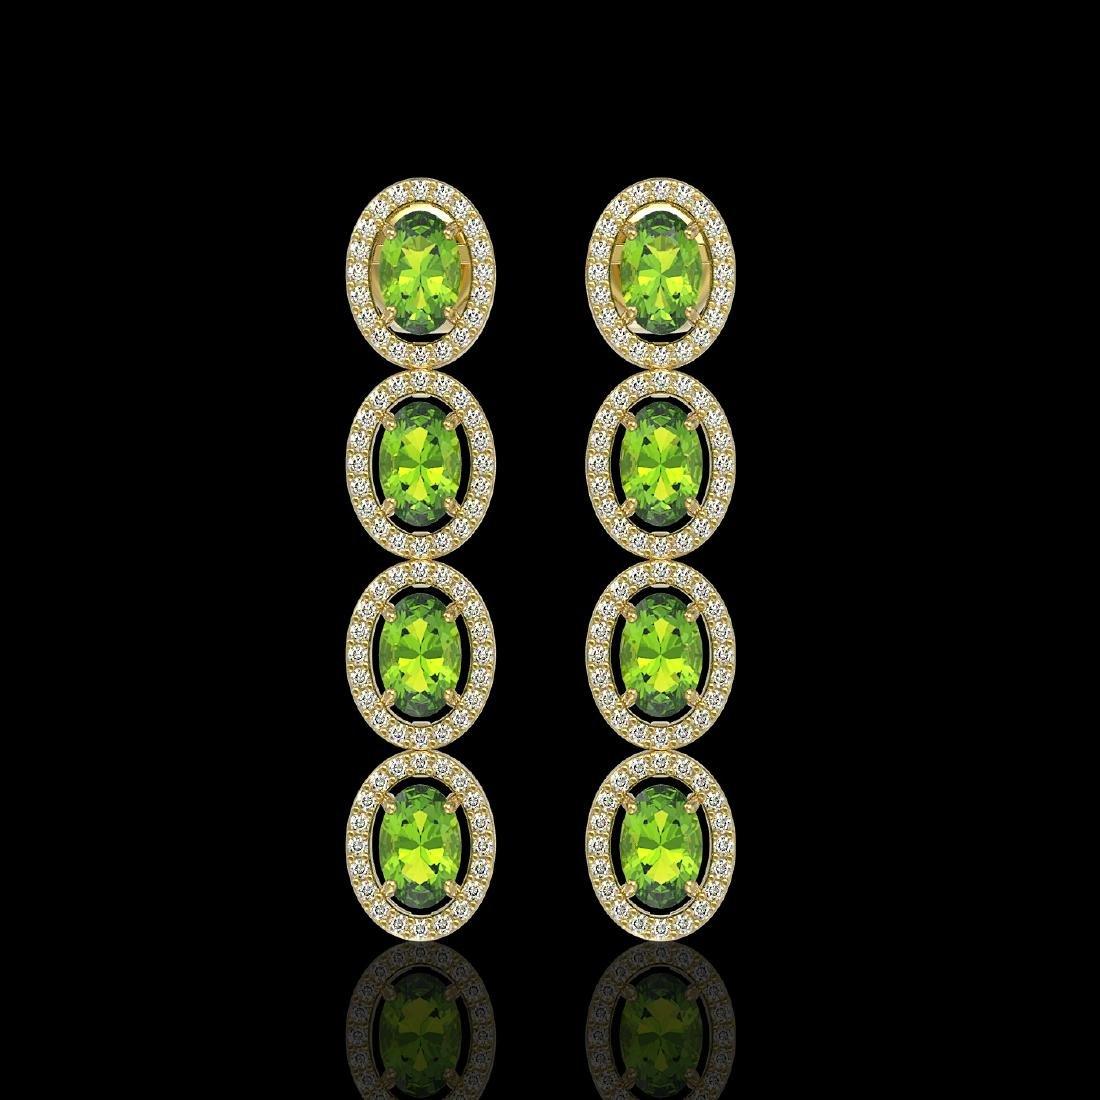 5.88 ctw Peridot & Diamond Halo Earrings 10K Yellow